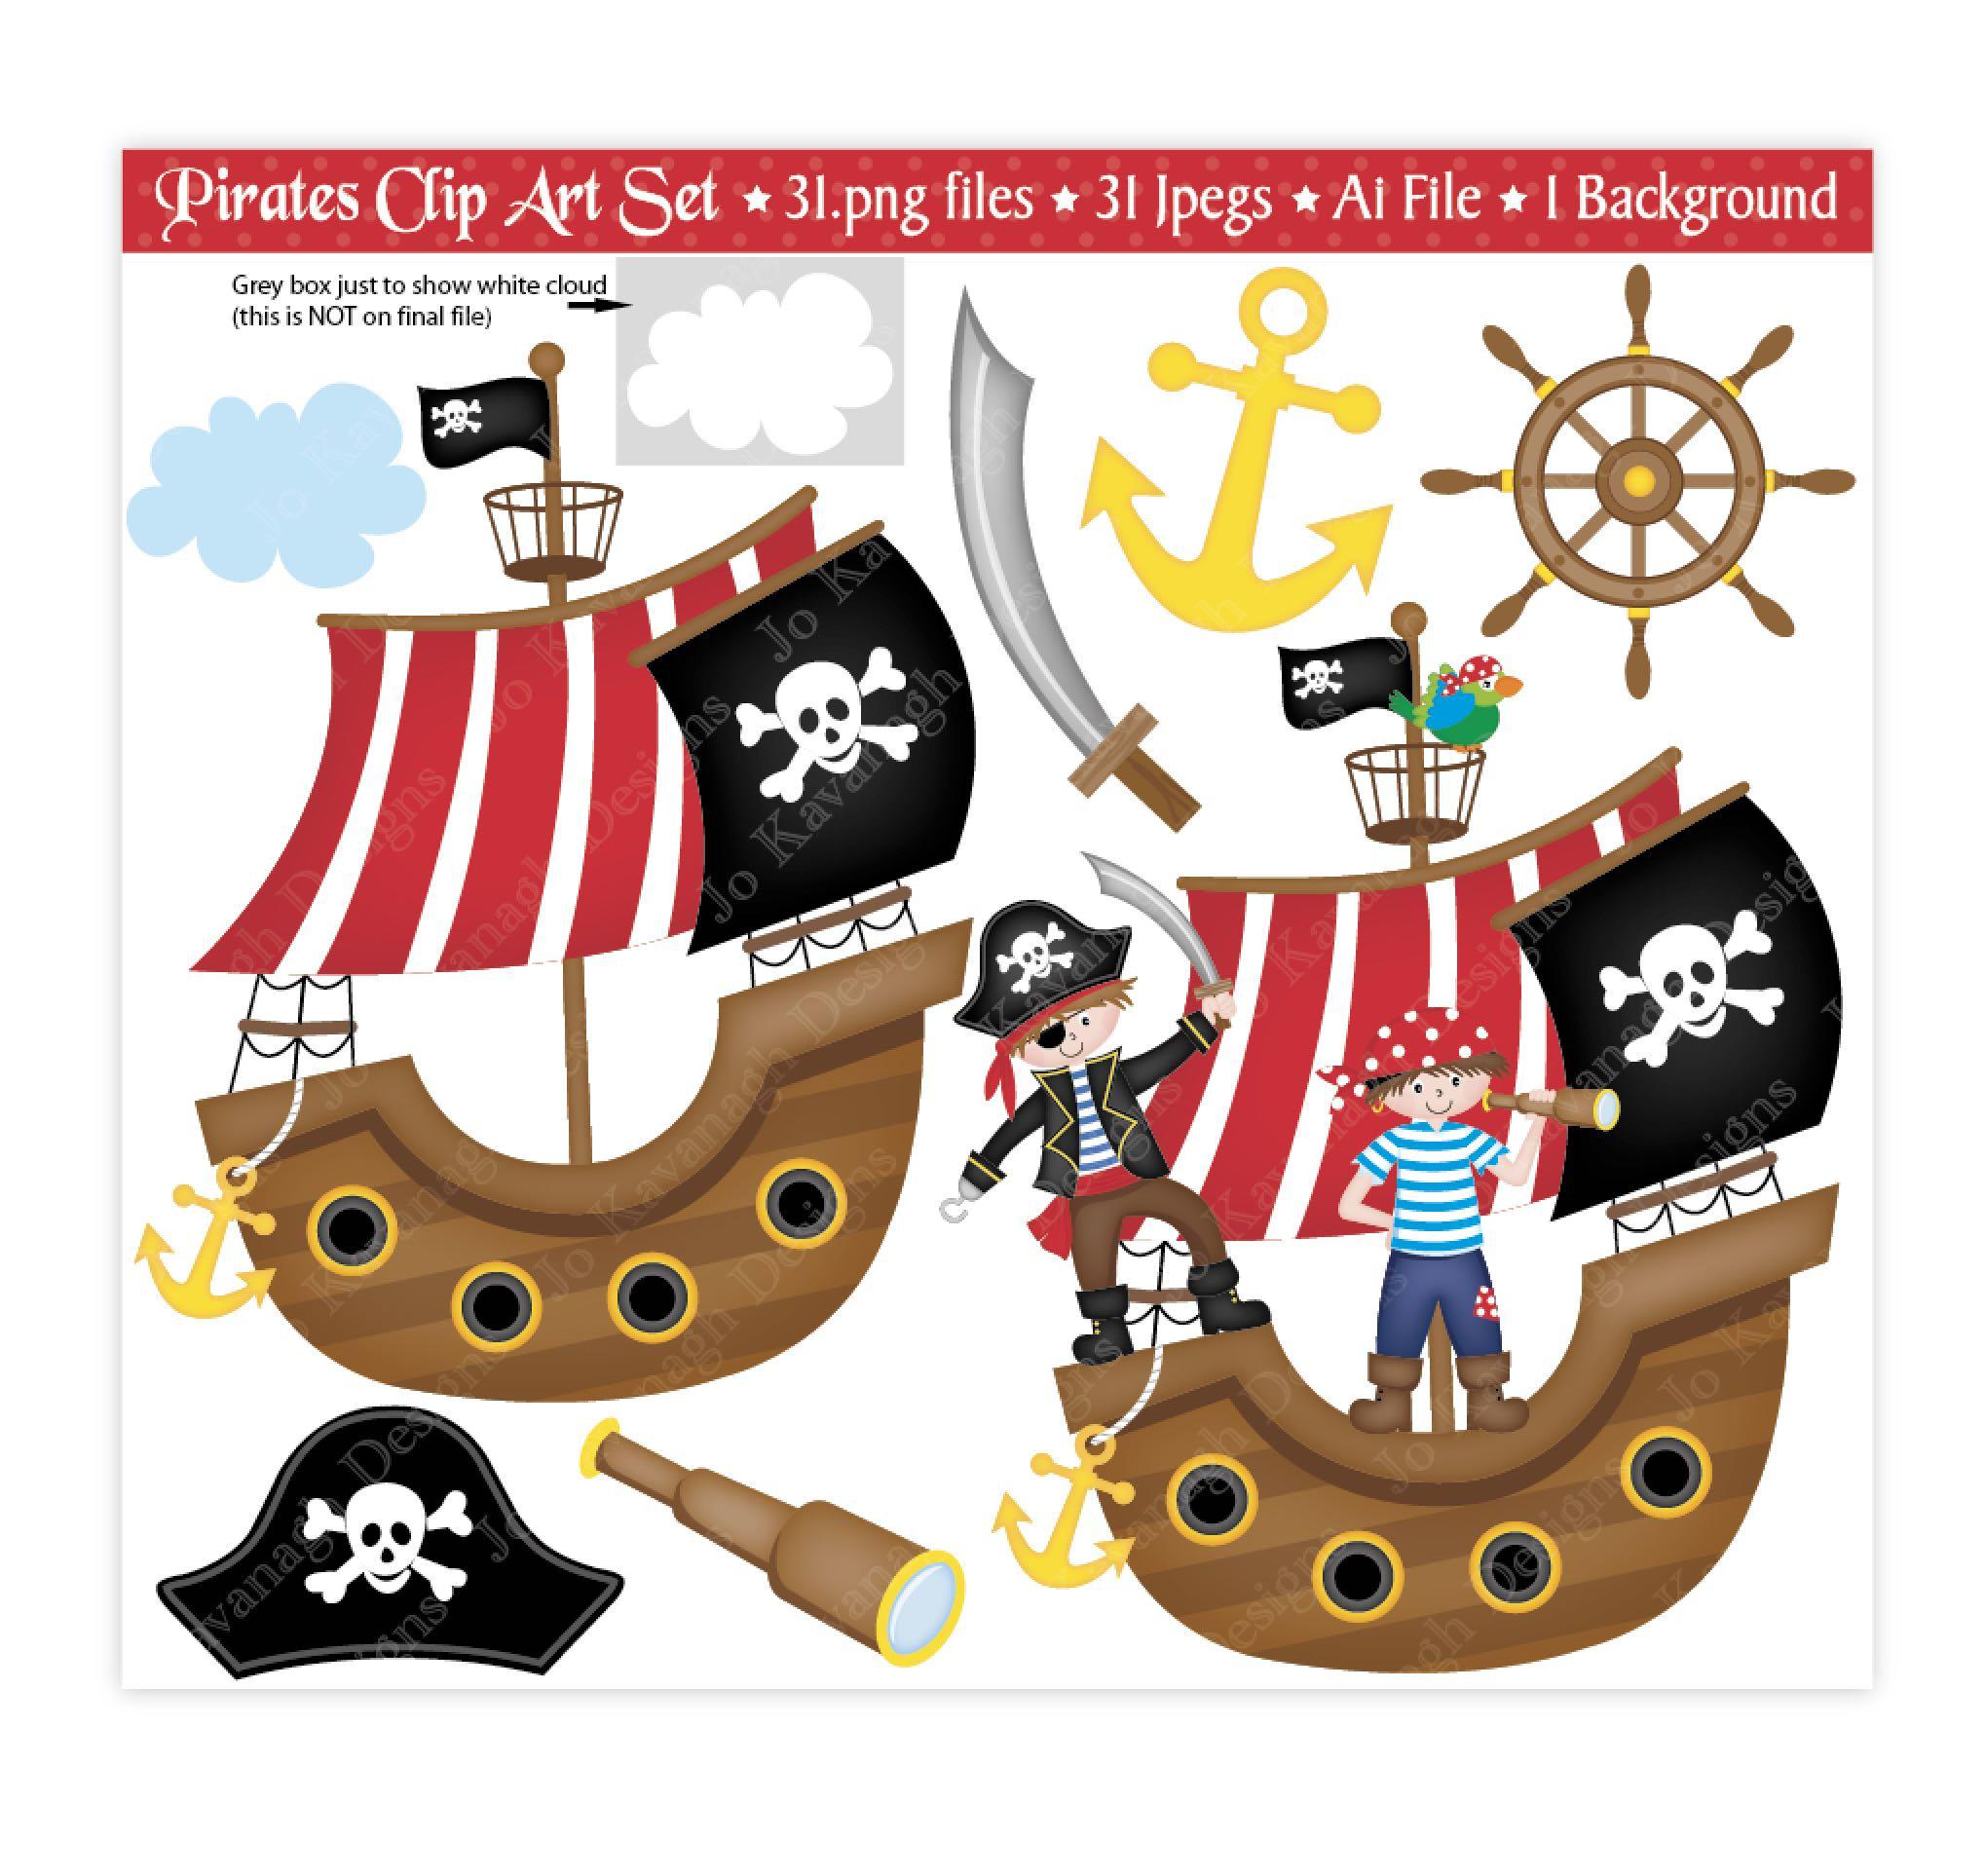 2038x1926 Pirate Clip Art,pirate Clipart,pirates Clipart,clipart,pirate Ship